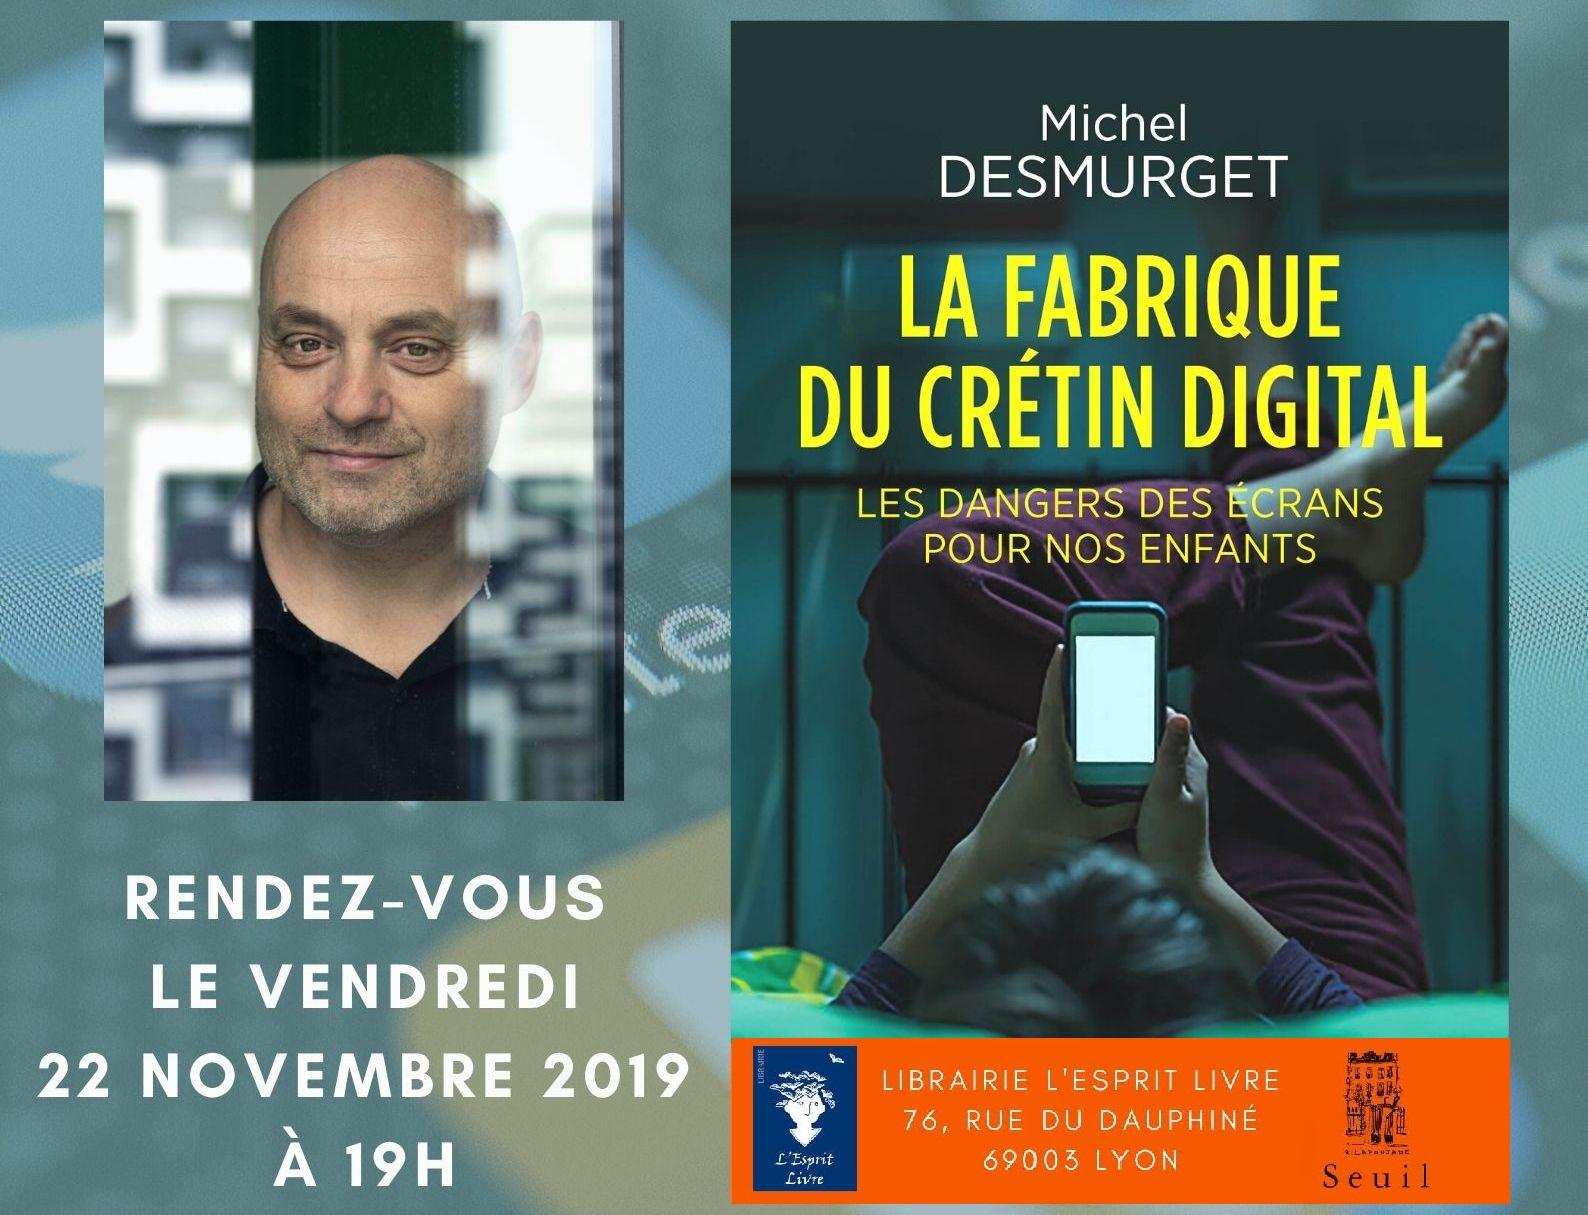 La fabrique du crétin digital - Michel Desmurget